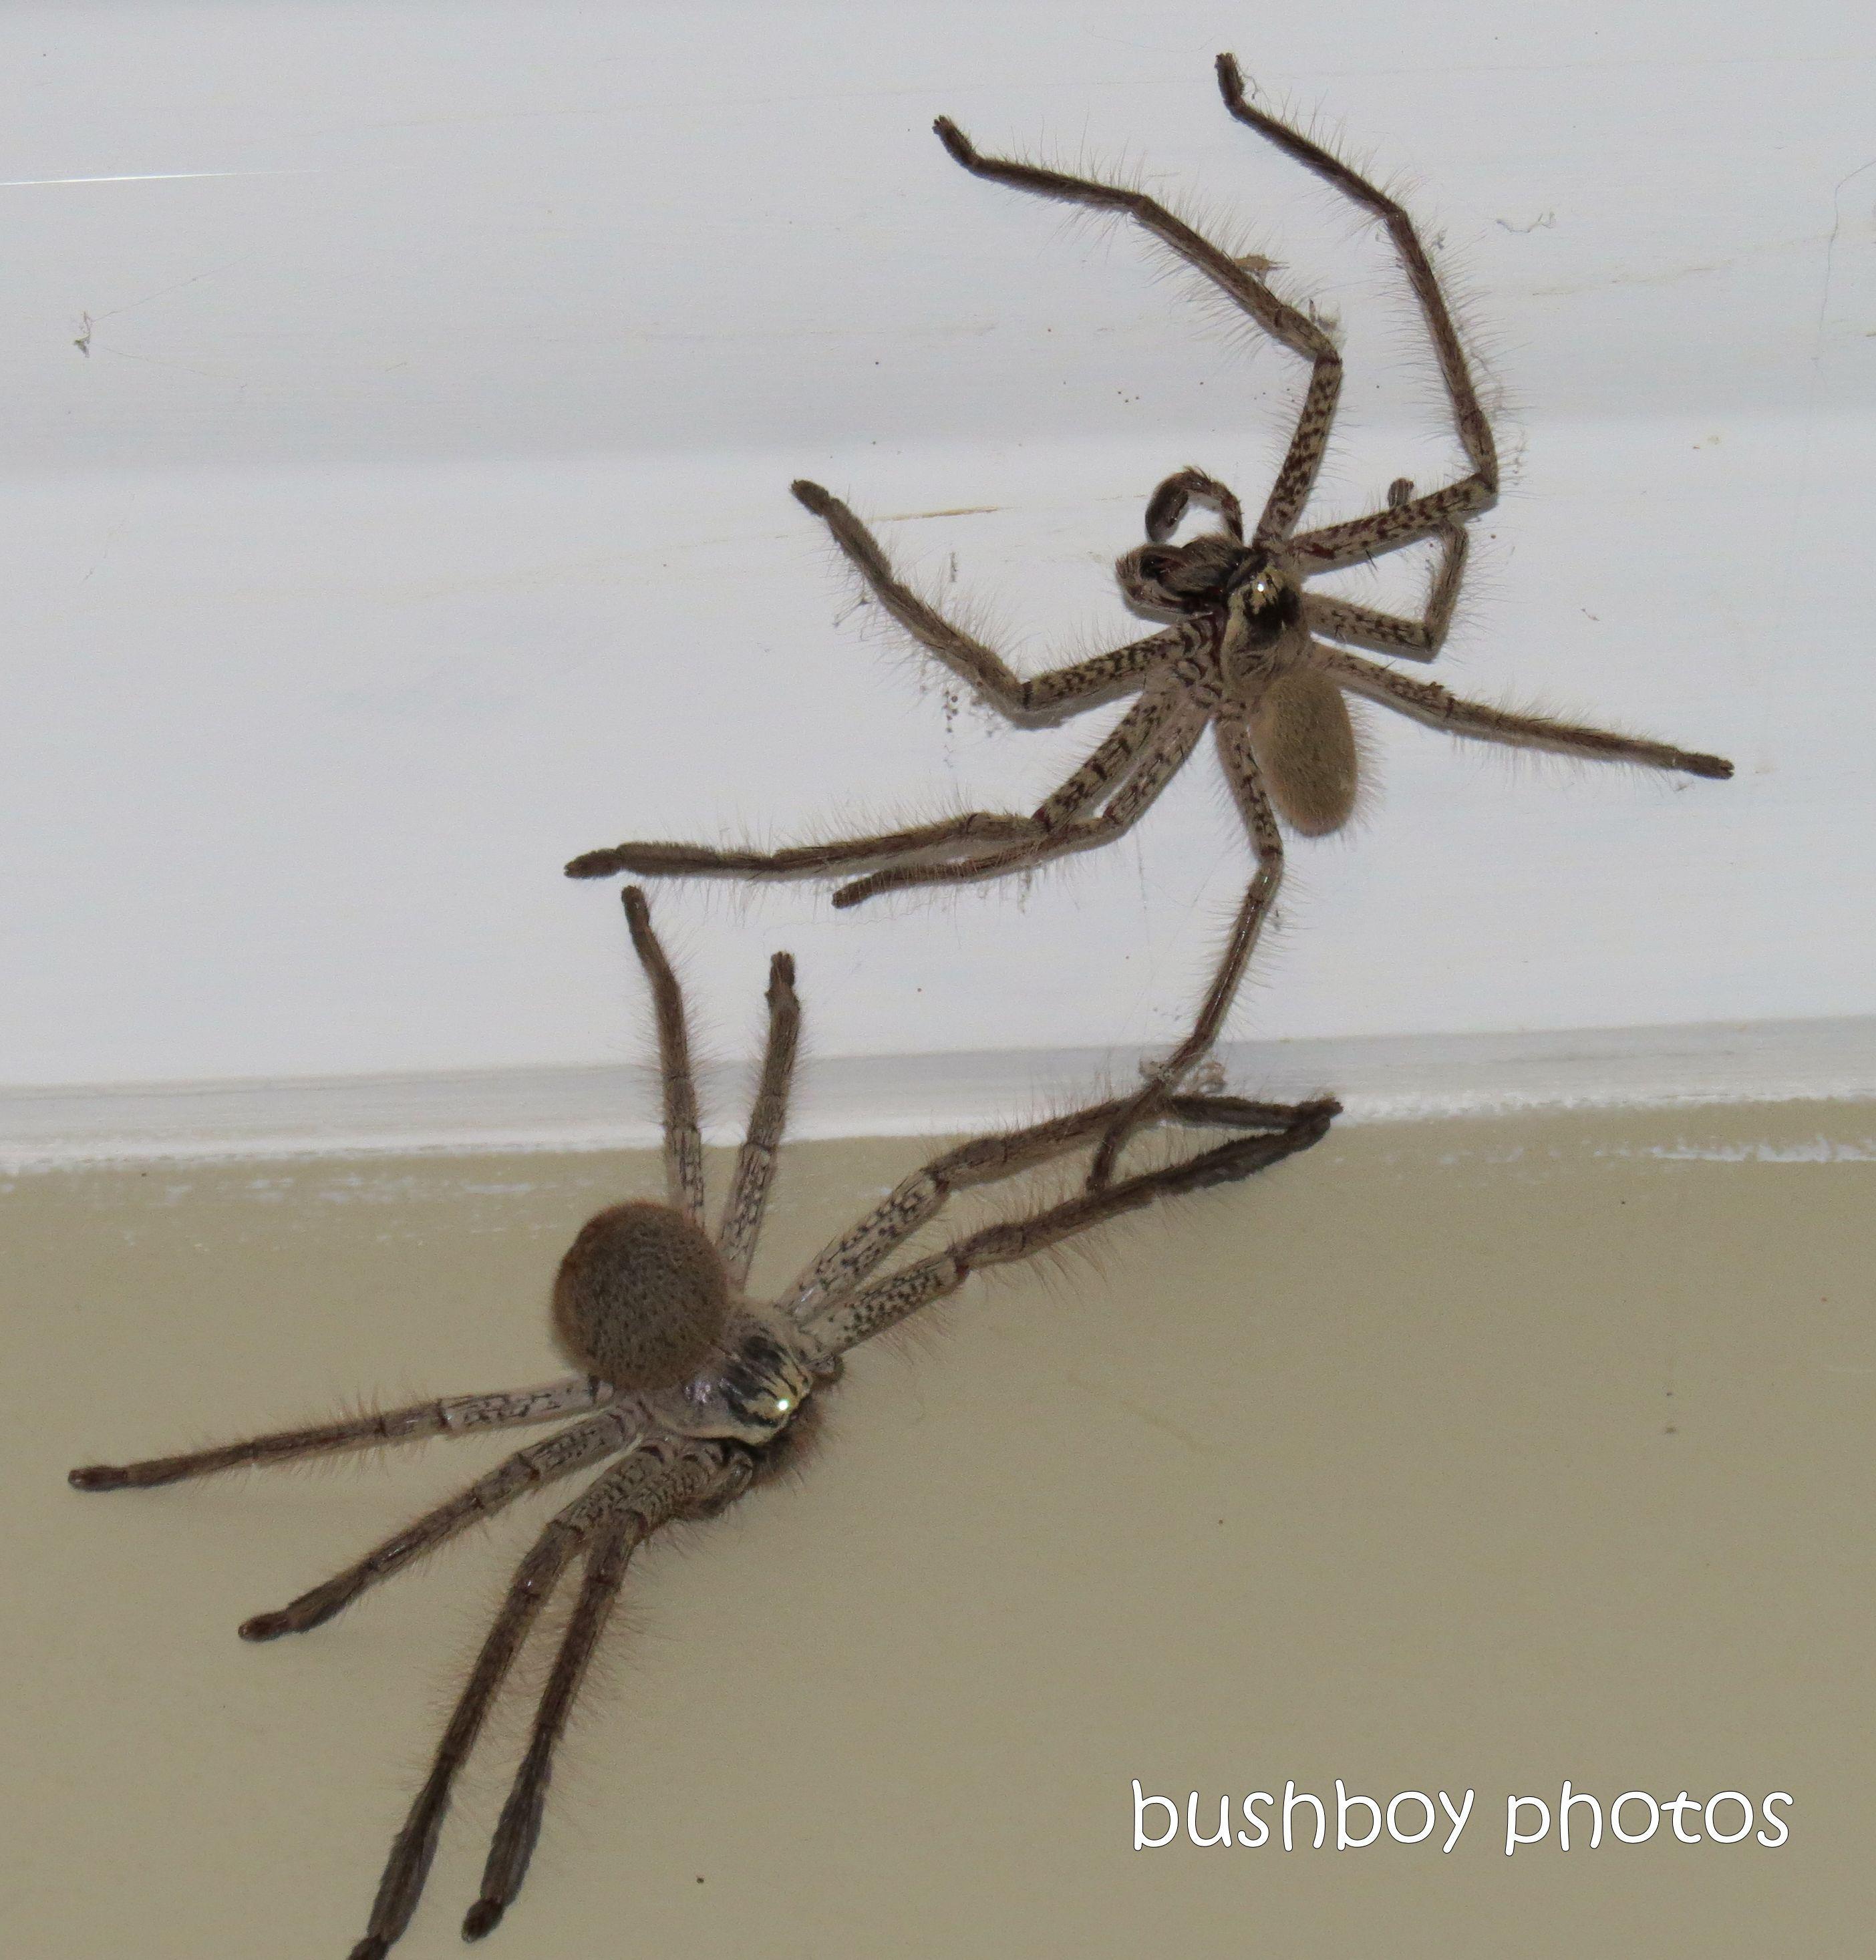 170907_word_intruding_huntsman spiderd